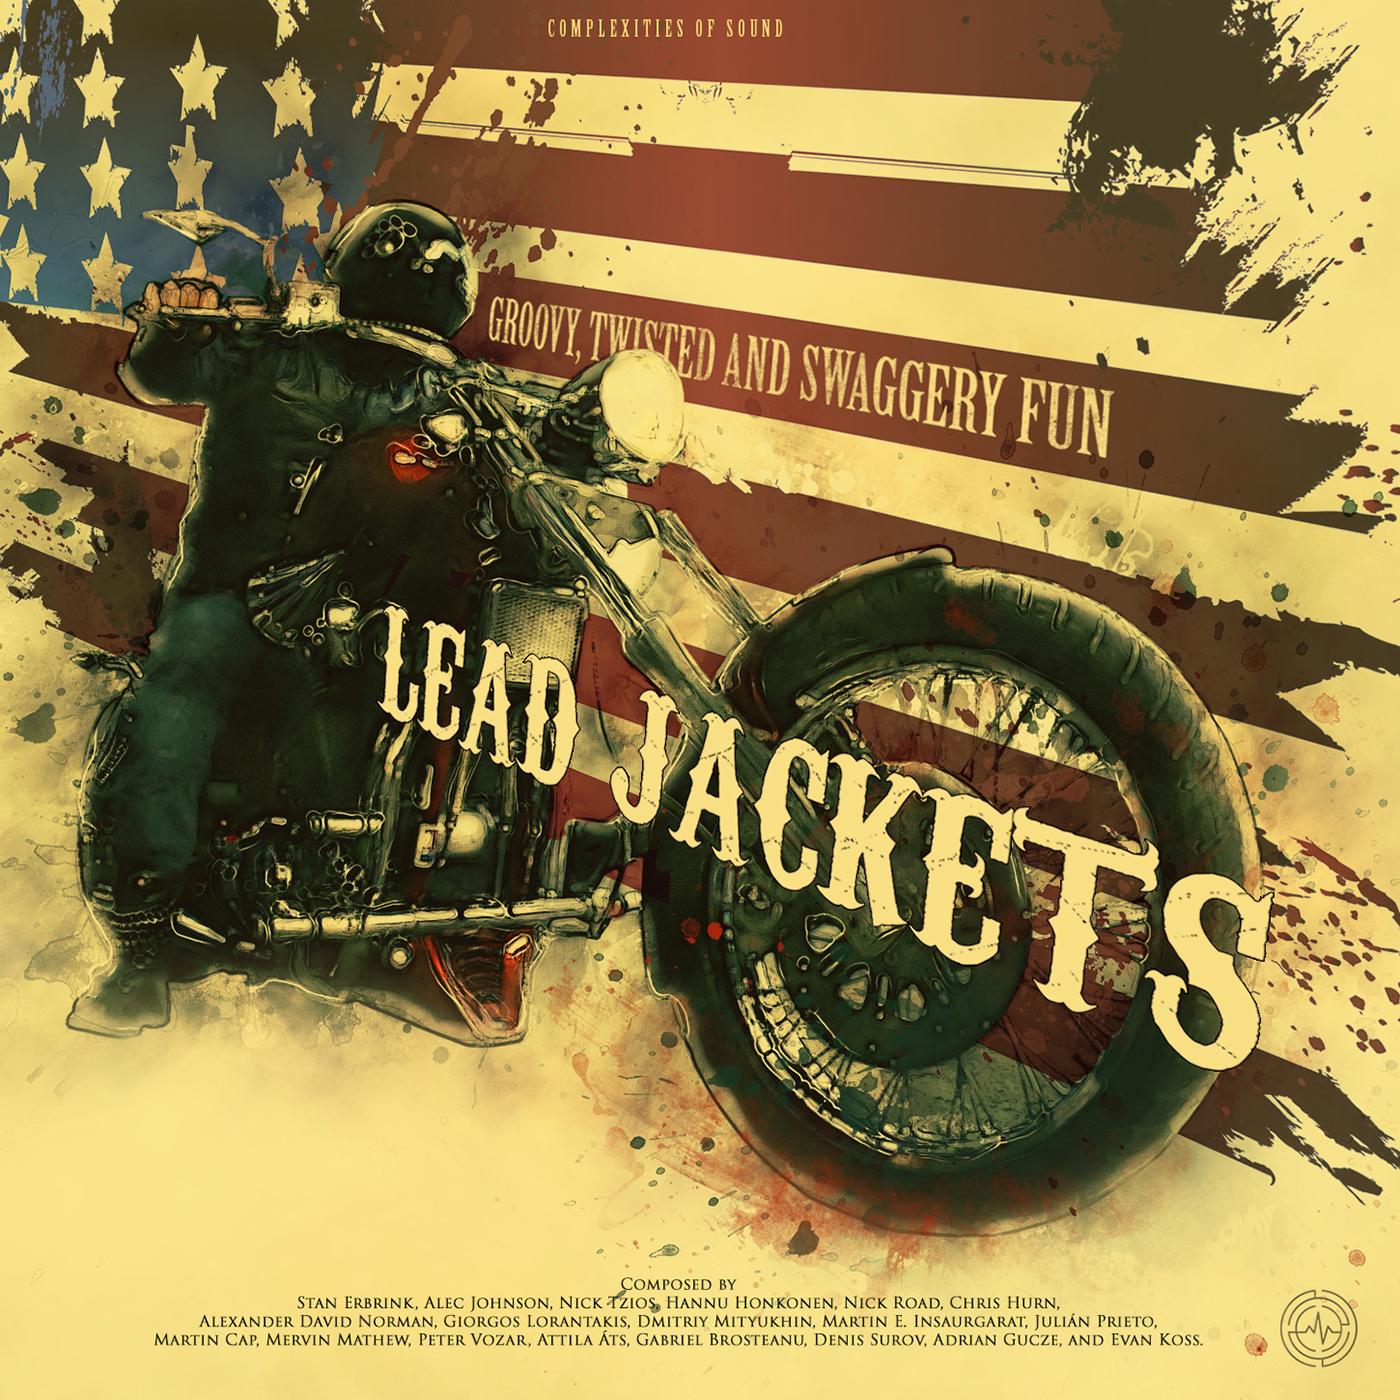 Lead Jackets